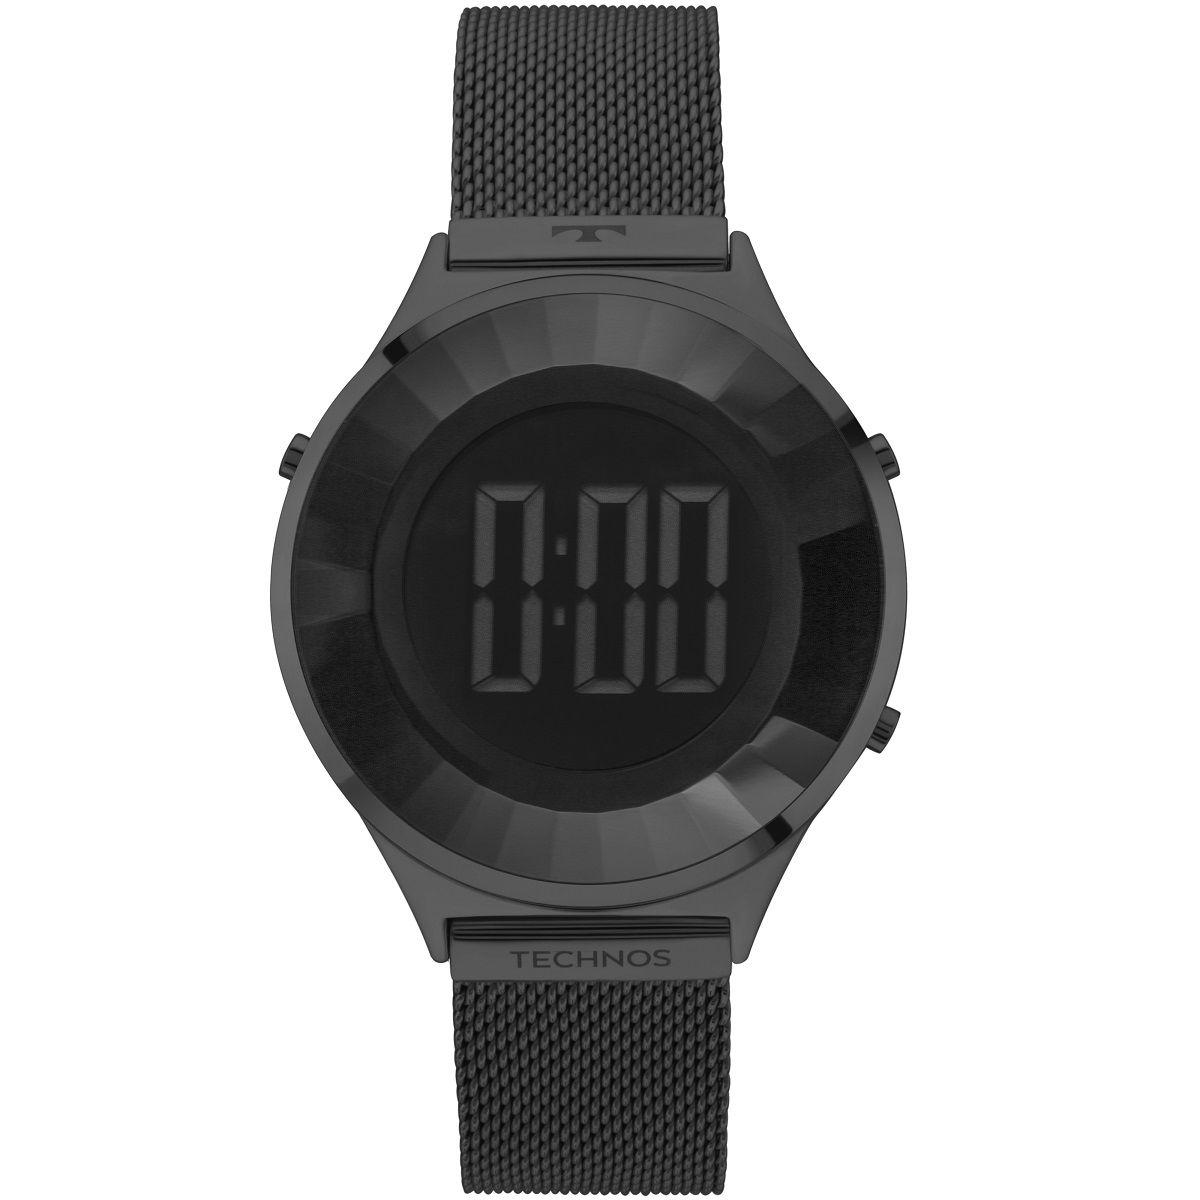 Relógio Feminino Technos Elegance Crystal BJ3851AE/4P 40mm Aço Preto